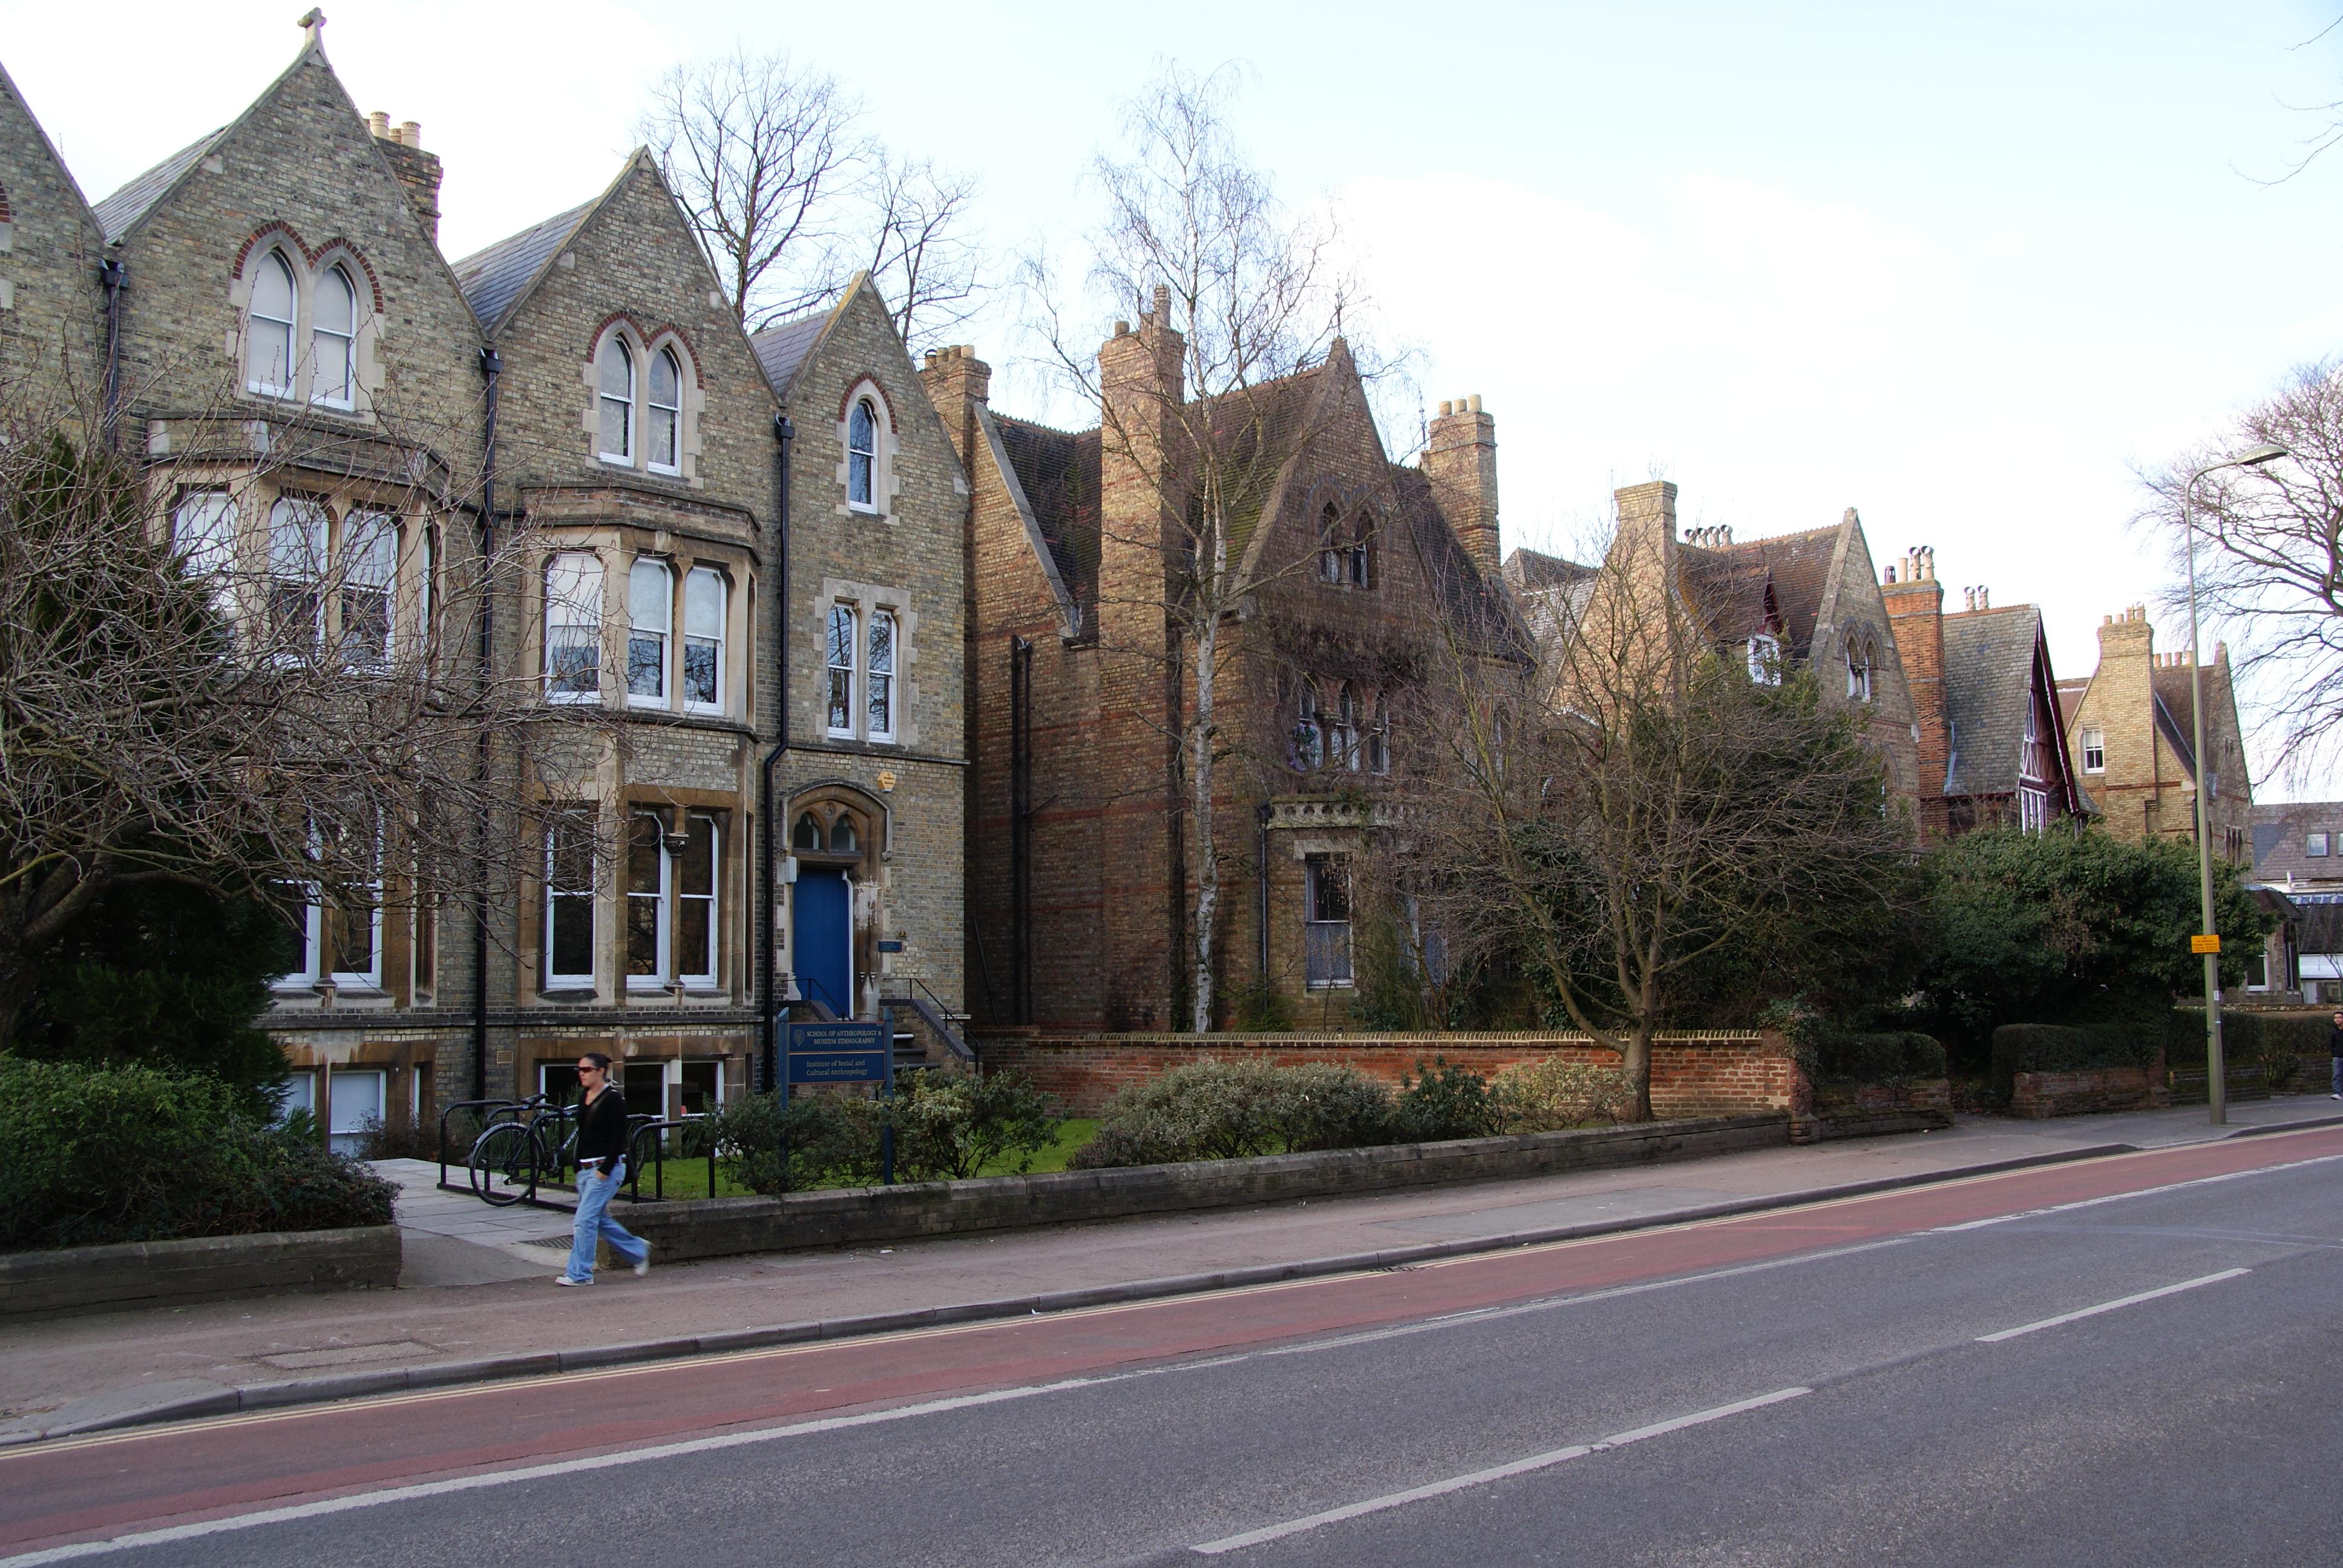 File:Banbury Road, Oxford - geograph.org.uk - 1740251.jpg ...